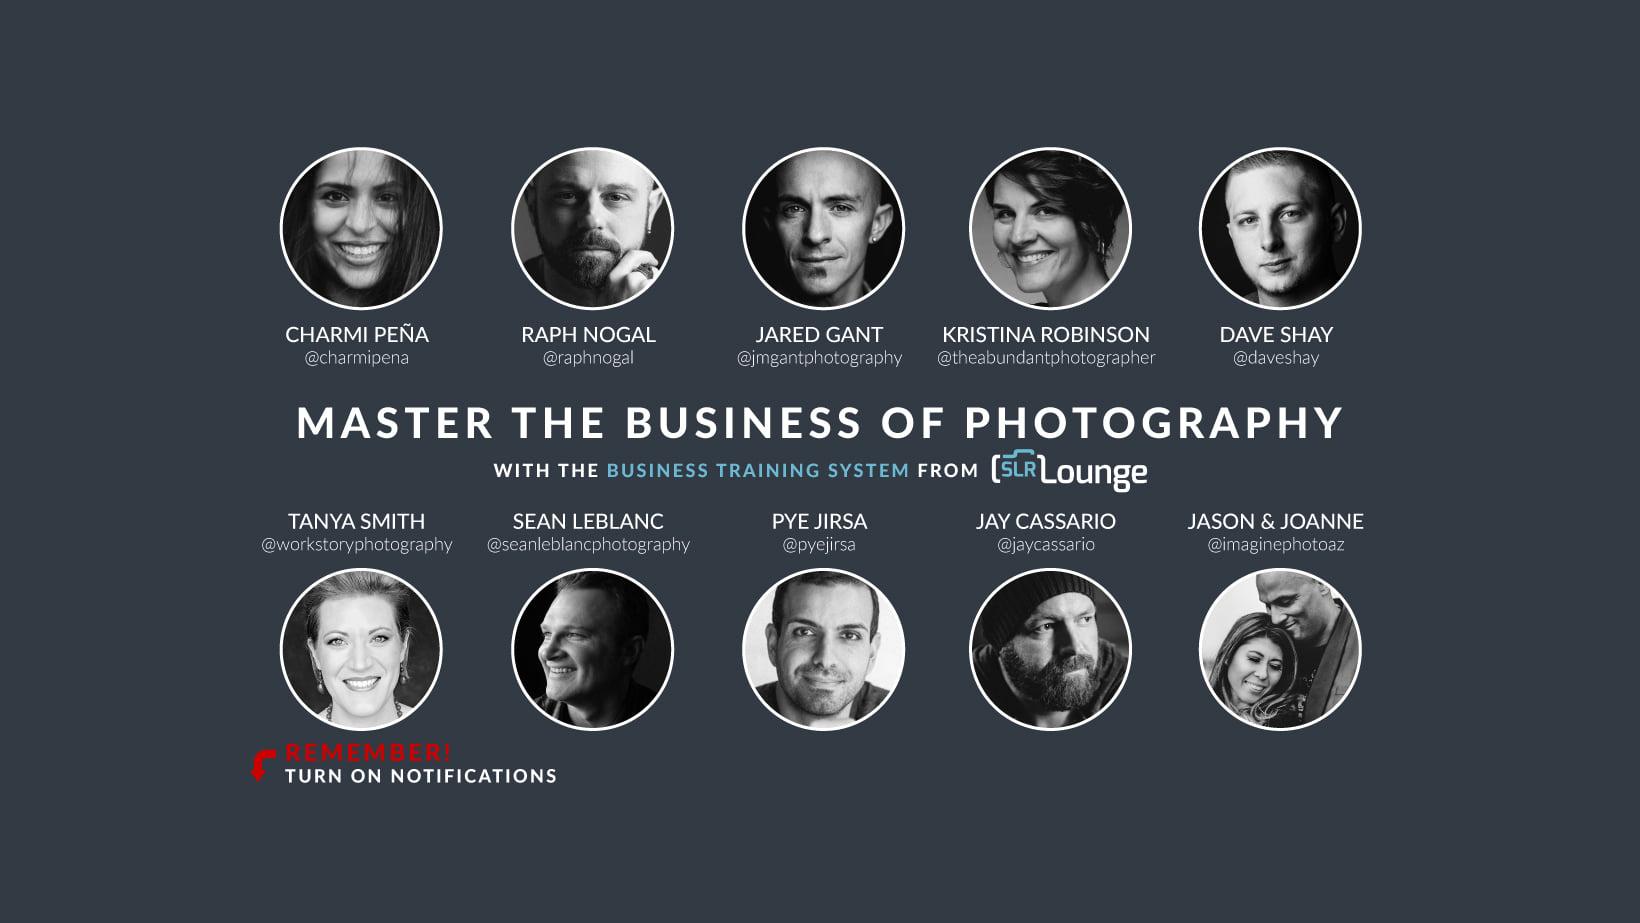 Master the business of photography with Charmi Pena, Raph Nogal, Jared Gant, Krstina Robinson, Dave Shay, Tanya Smith, Sean Leblanc, Pye Jirsa, Jay Cassario and Jason & Joanne Marino.